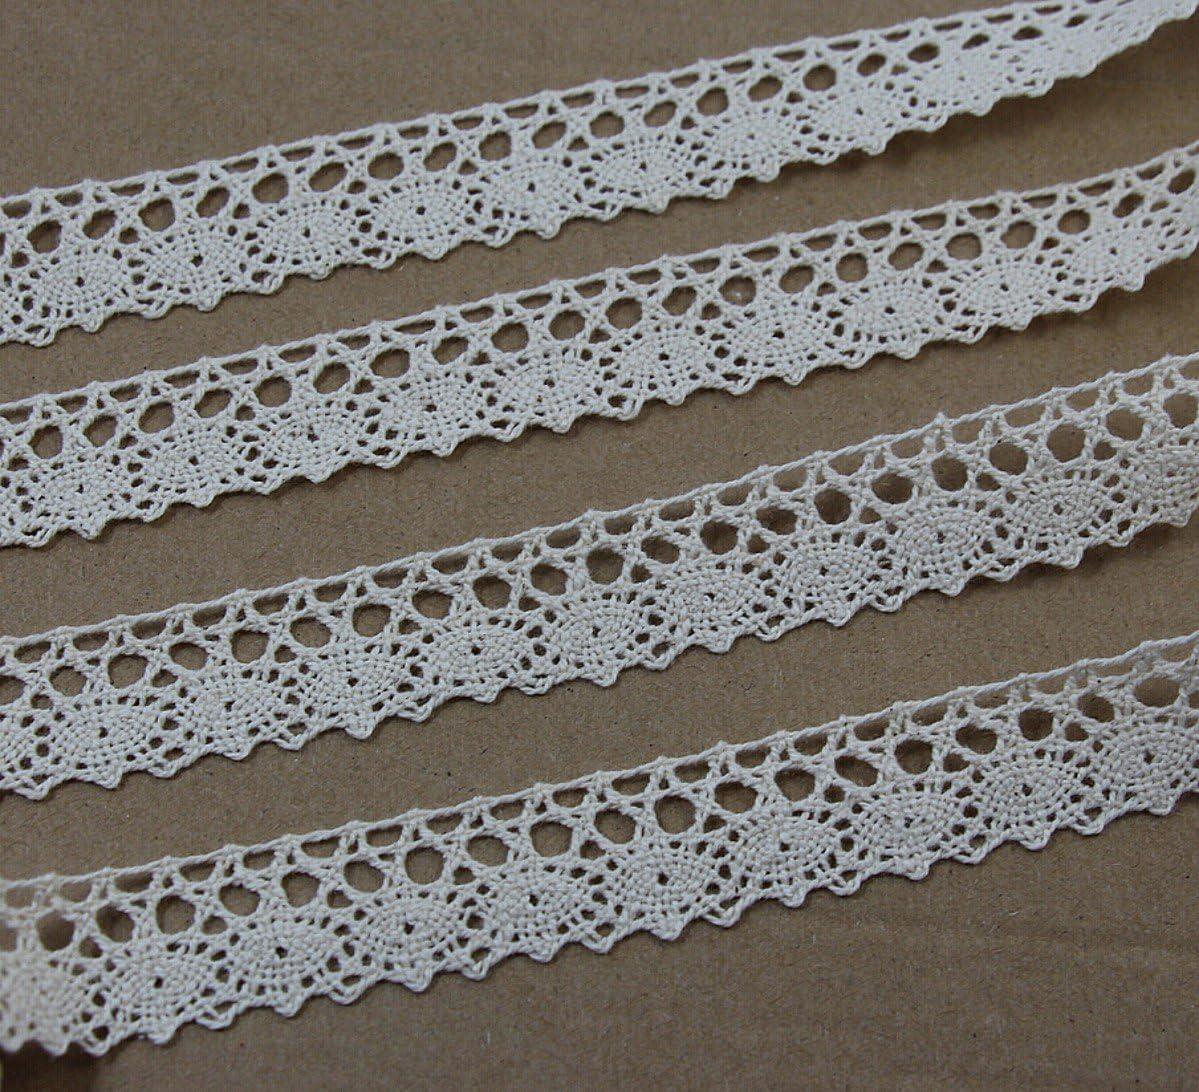 Lace Cotton Ribbon Trim Pattern Gift Wrap Decor Ideas 15 Yard Roll